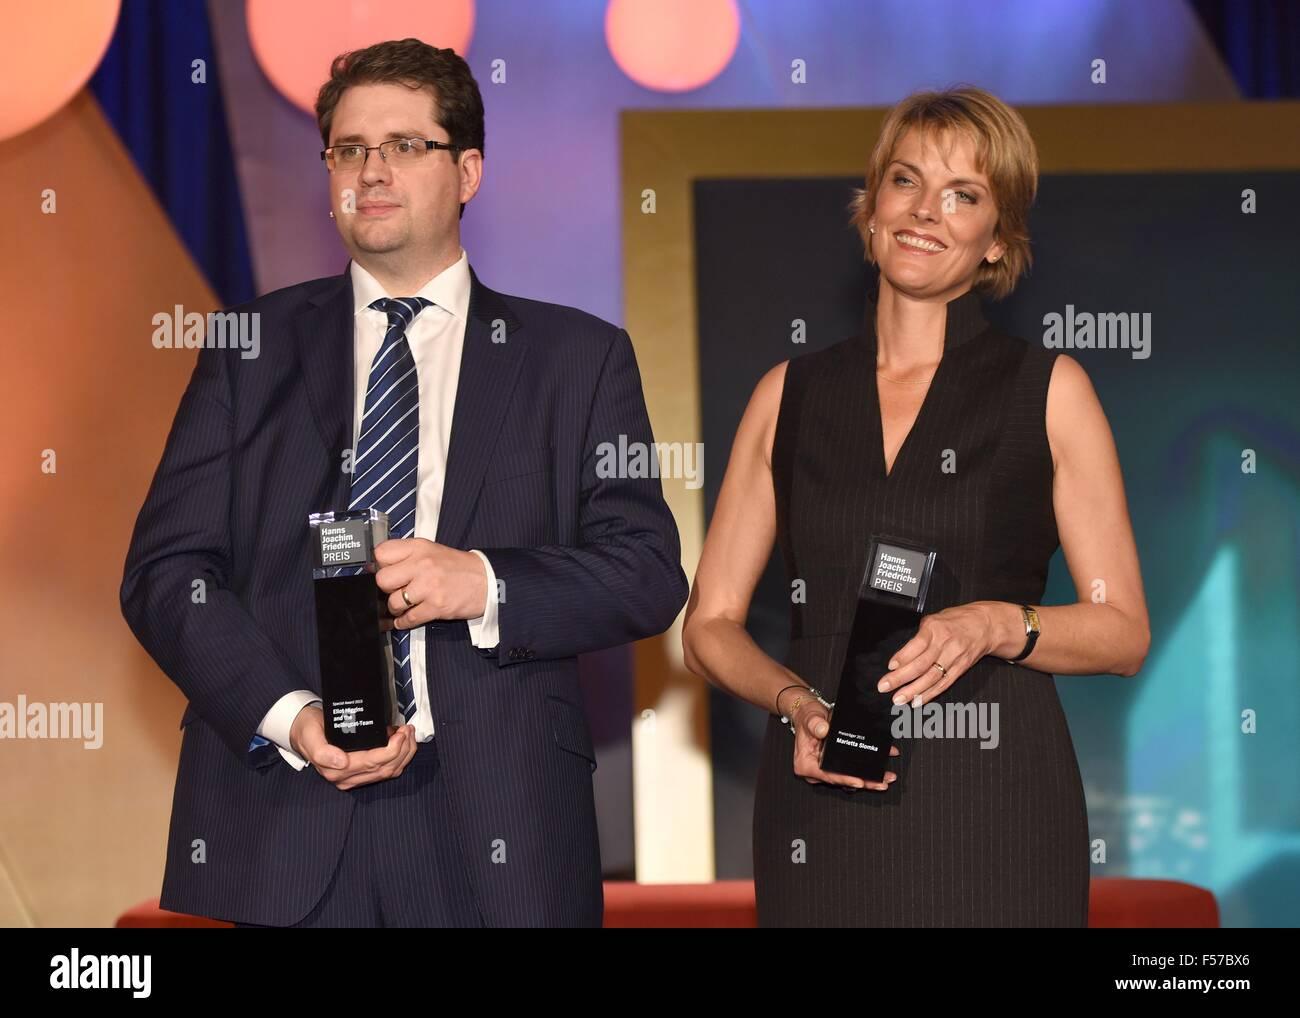 Cologne, Germany. 28th Oct, 2015. The award winners, British journalist Eliot Higgins and ZDF journalist Marietta Stock Photo